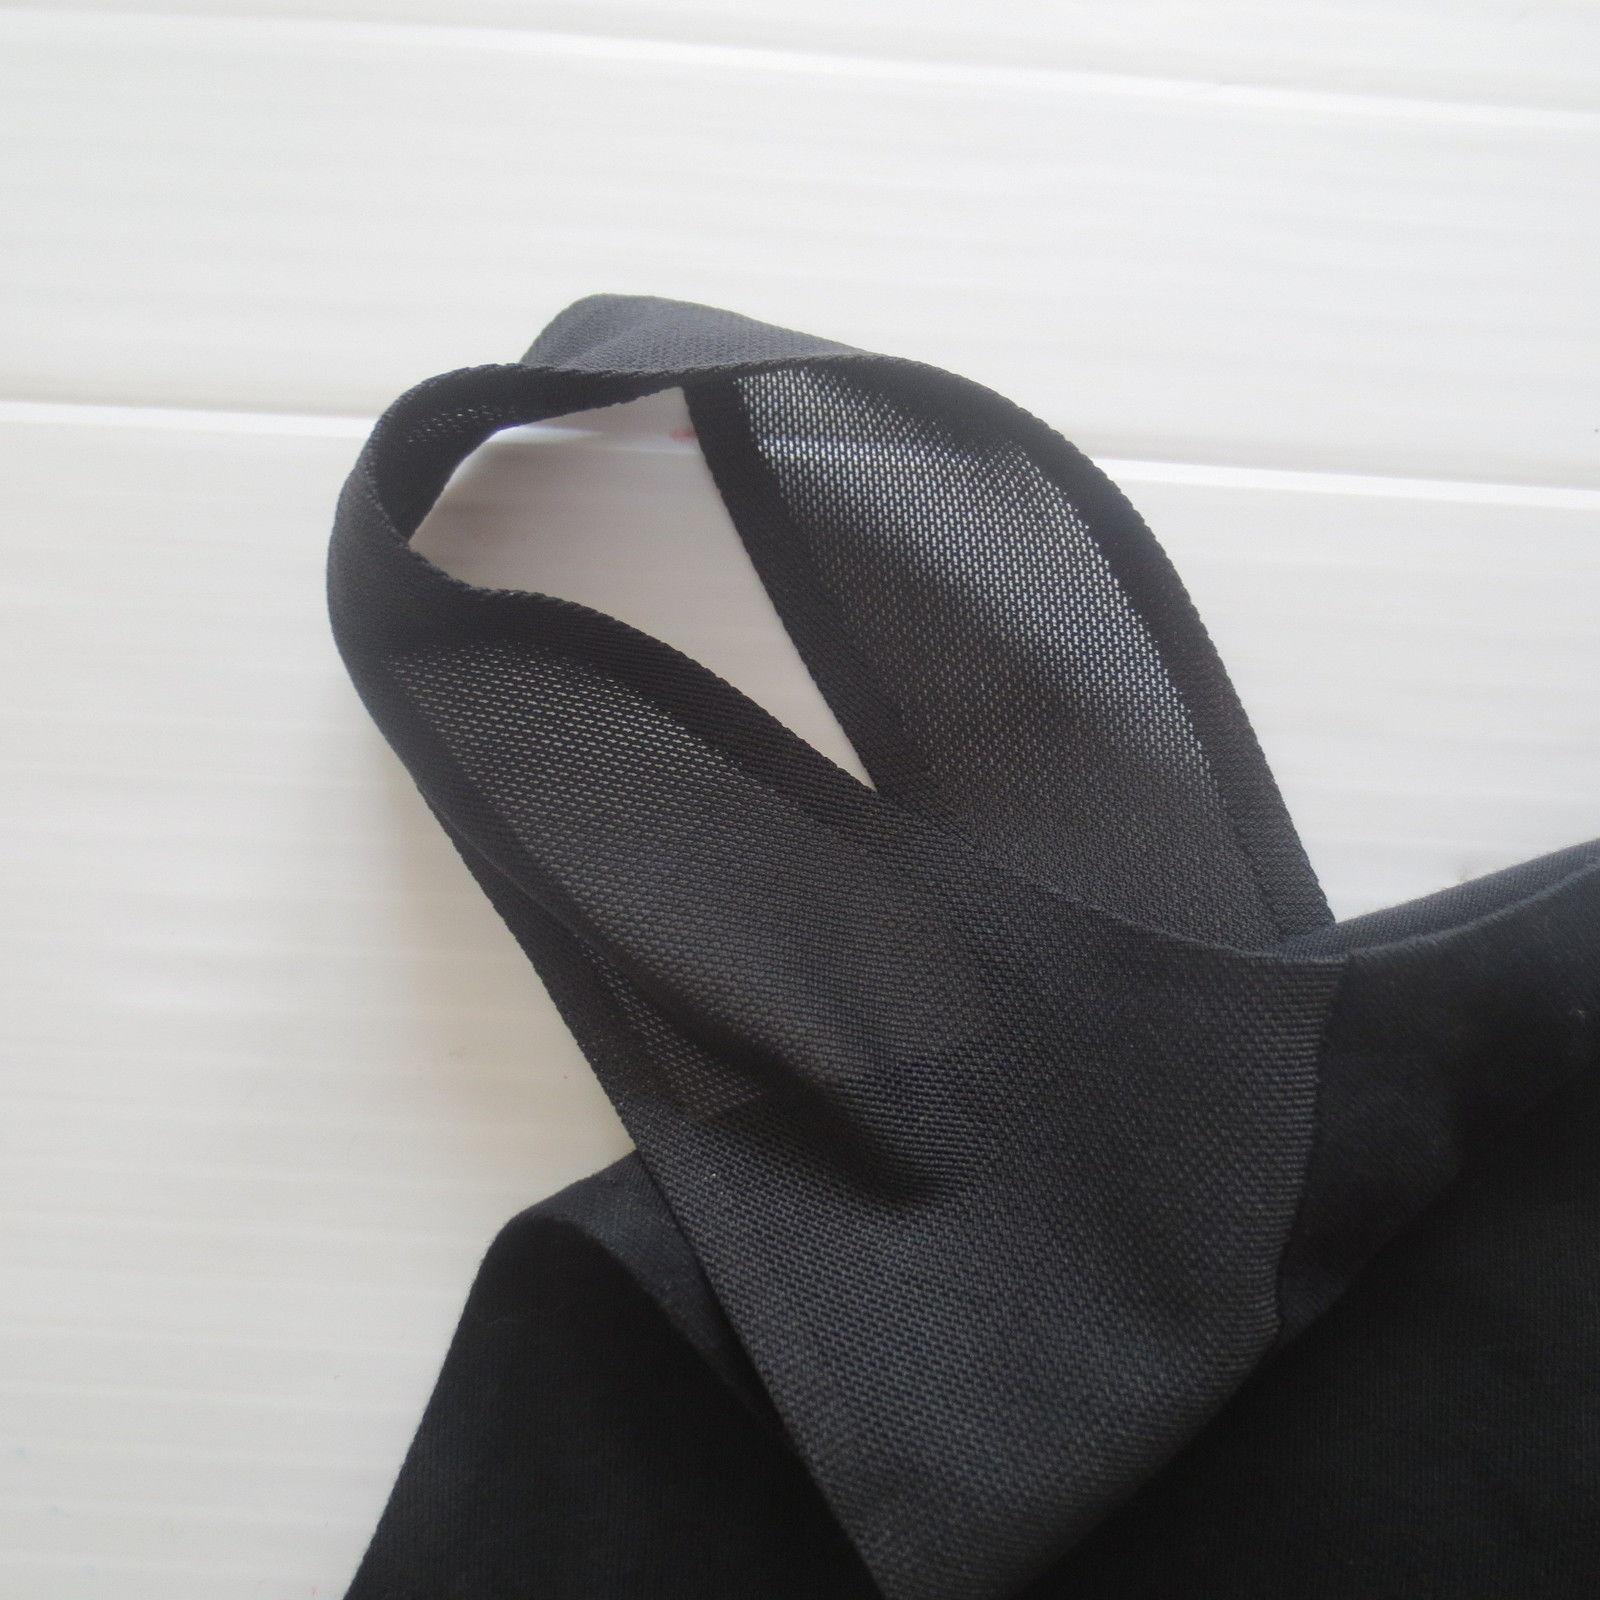 Nike Women Breathe Tank Top Shirt - 862774 - Black 010 - Size L - NWT image 4